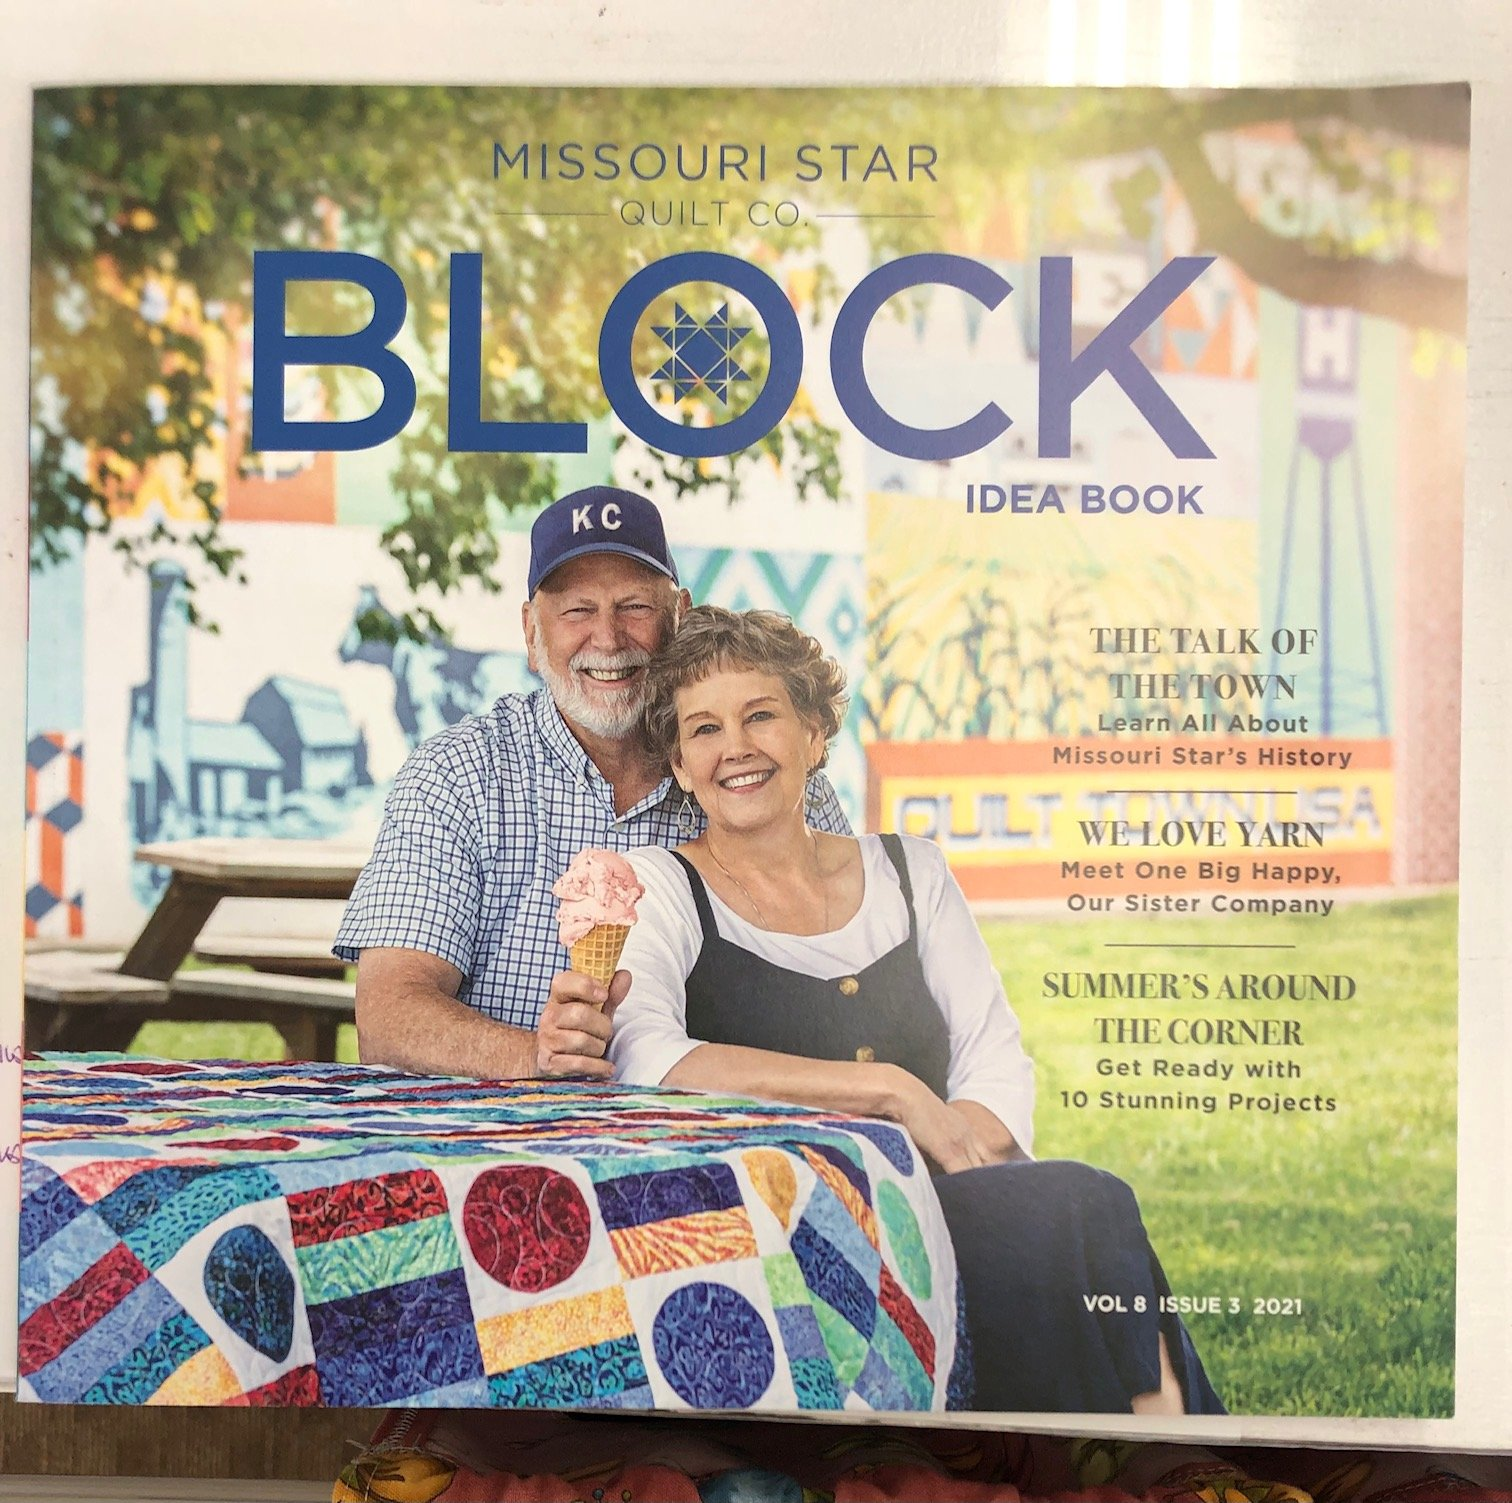 Block Magazine Vol 8 Isu 3 2021